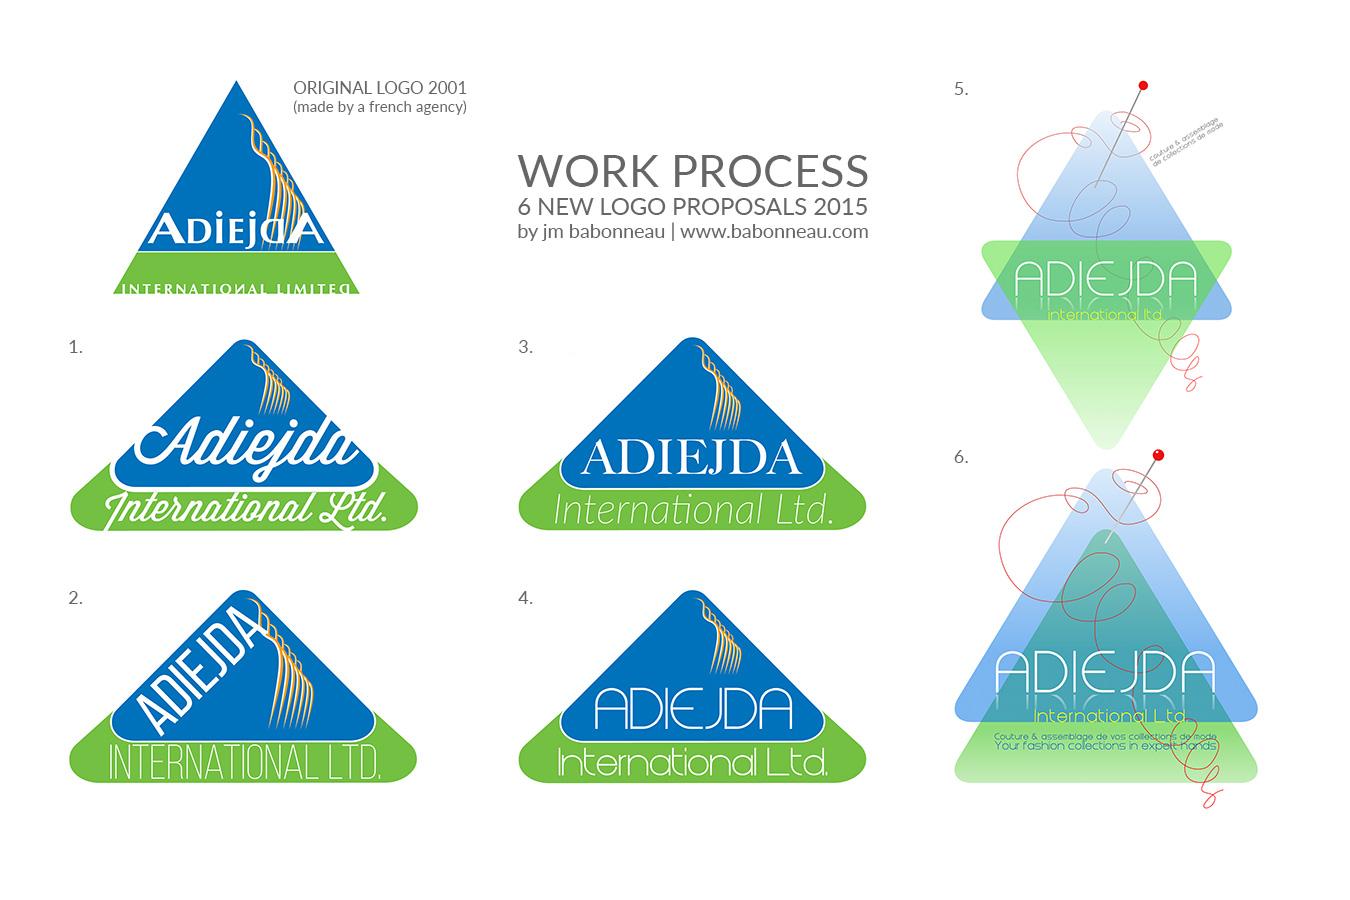 Logo_ADIEJDA_2015_MAKING_PROCESS_01_web.jpg